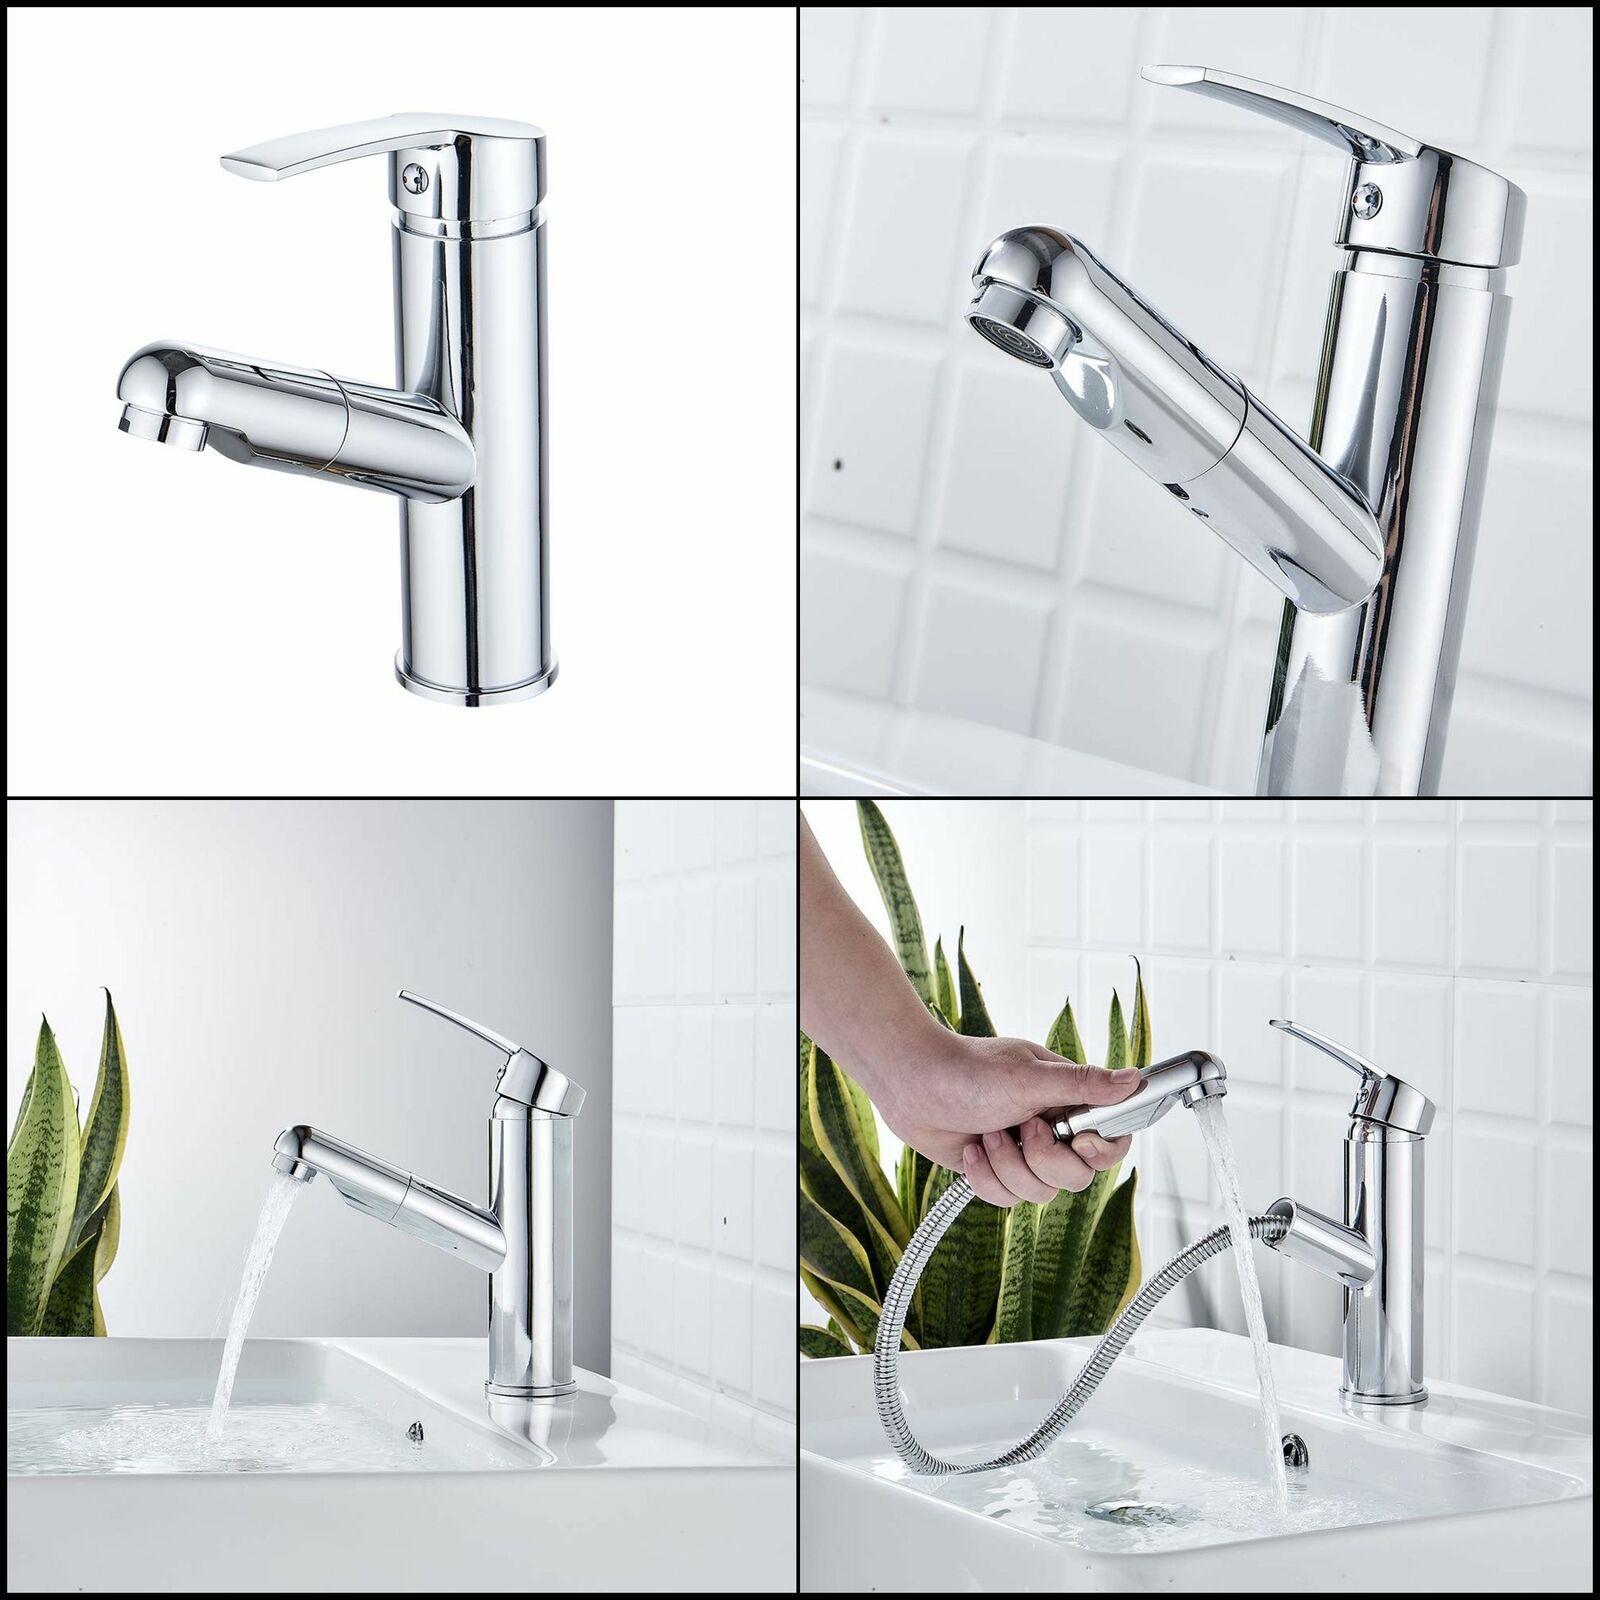 Bathroom Faucet Pule Out Solid Brass Lavatory Basin Sink Faucet